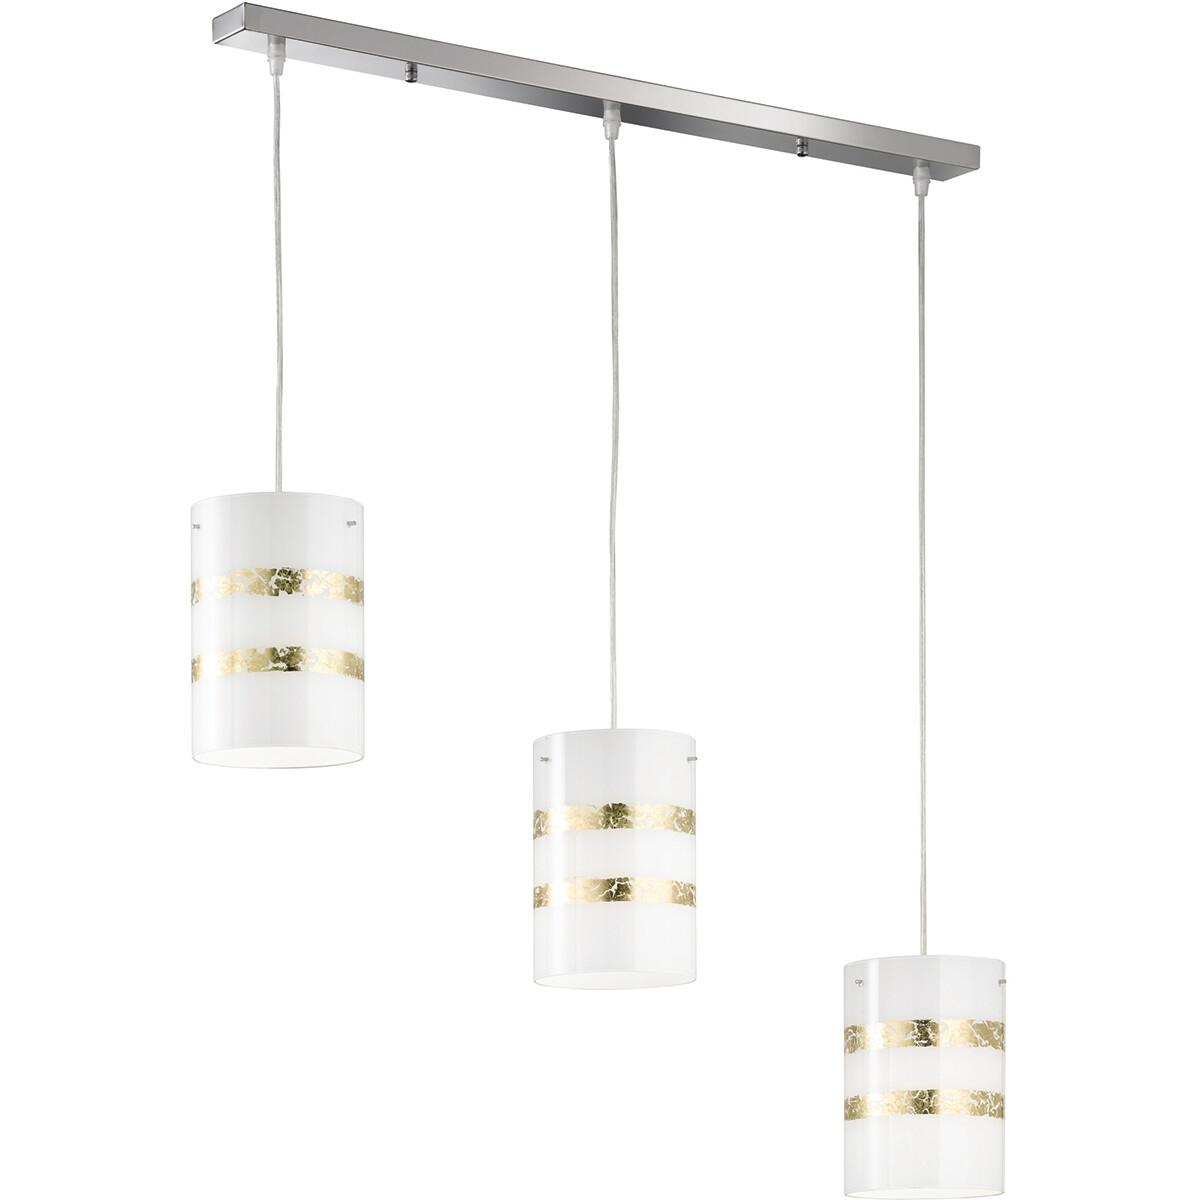 LED Hanglamp - Hangverlichting - Trion Niki - E27 Fitting - 3-lichts - Rechthoek - Mat Goud - Alumin